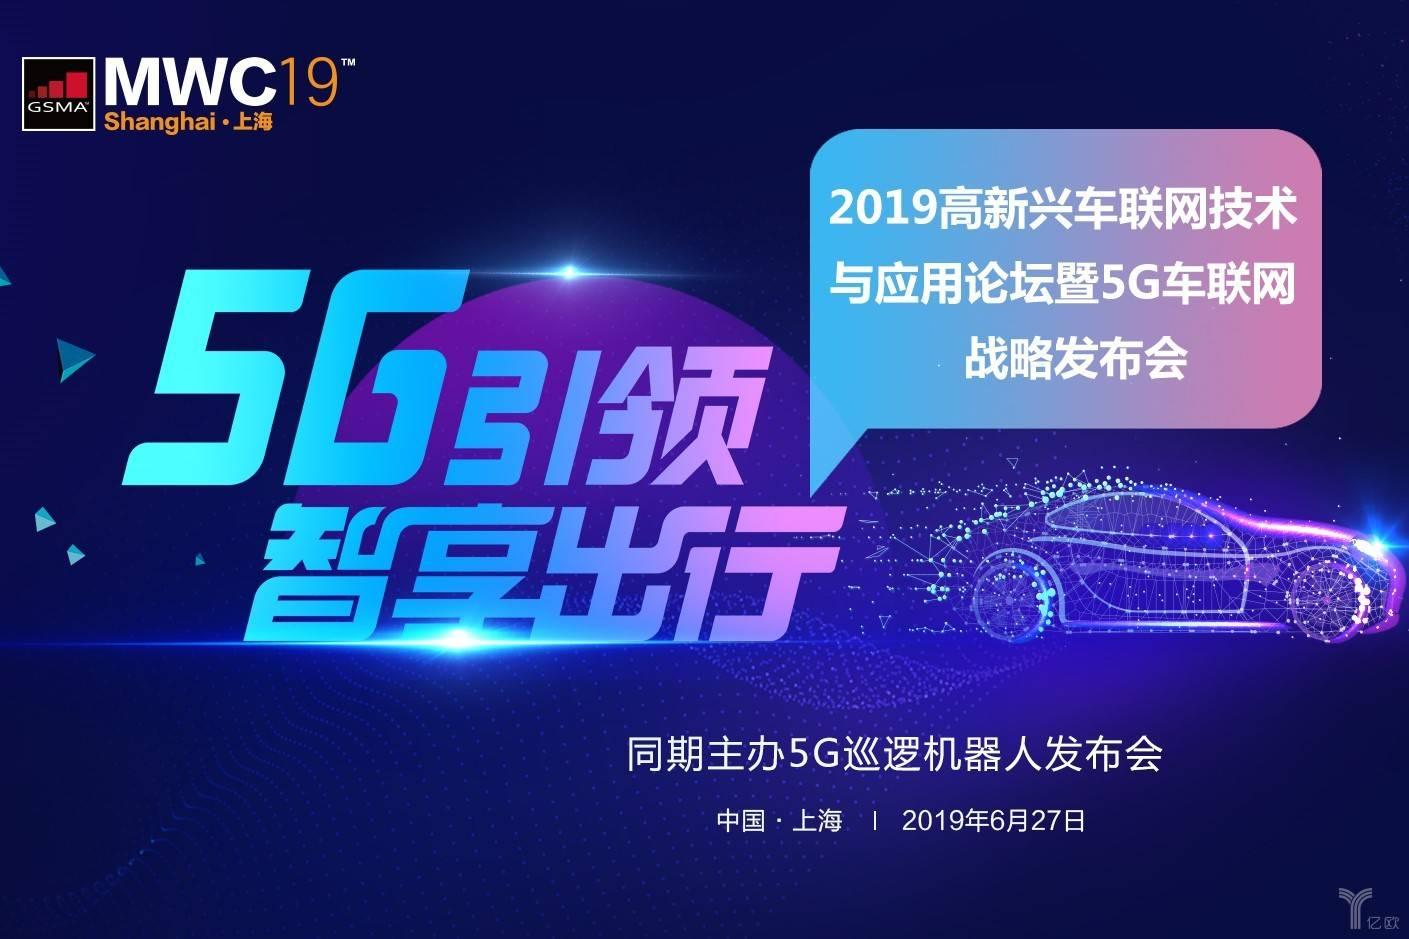 5G商用车联网鏖战升级,万亿市场谁执牛耳?